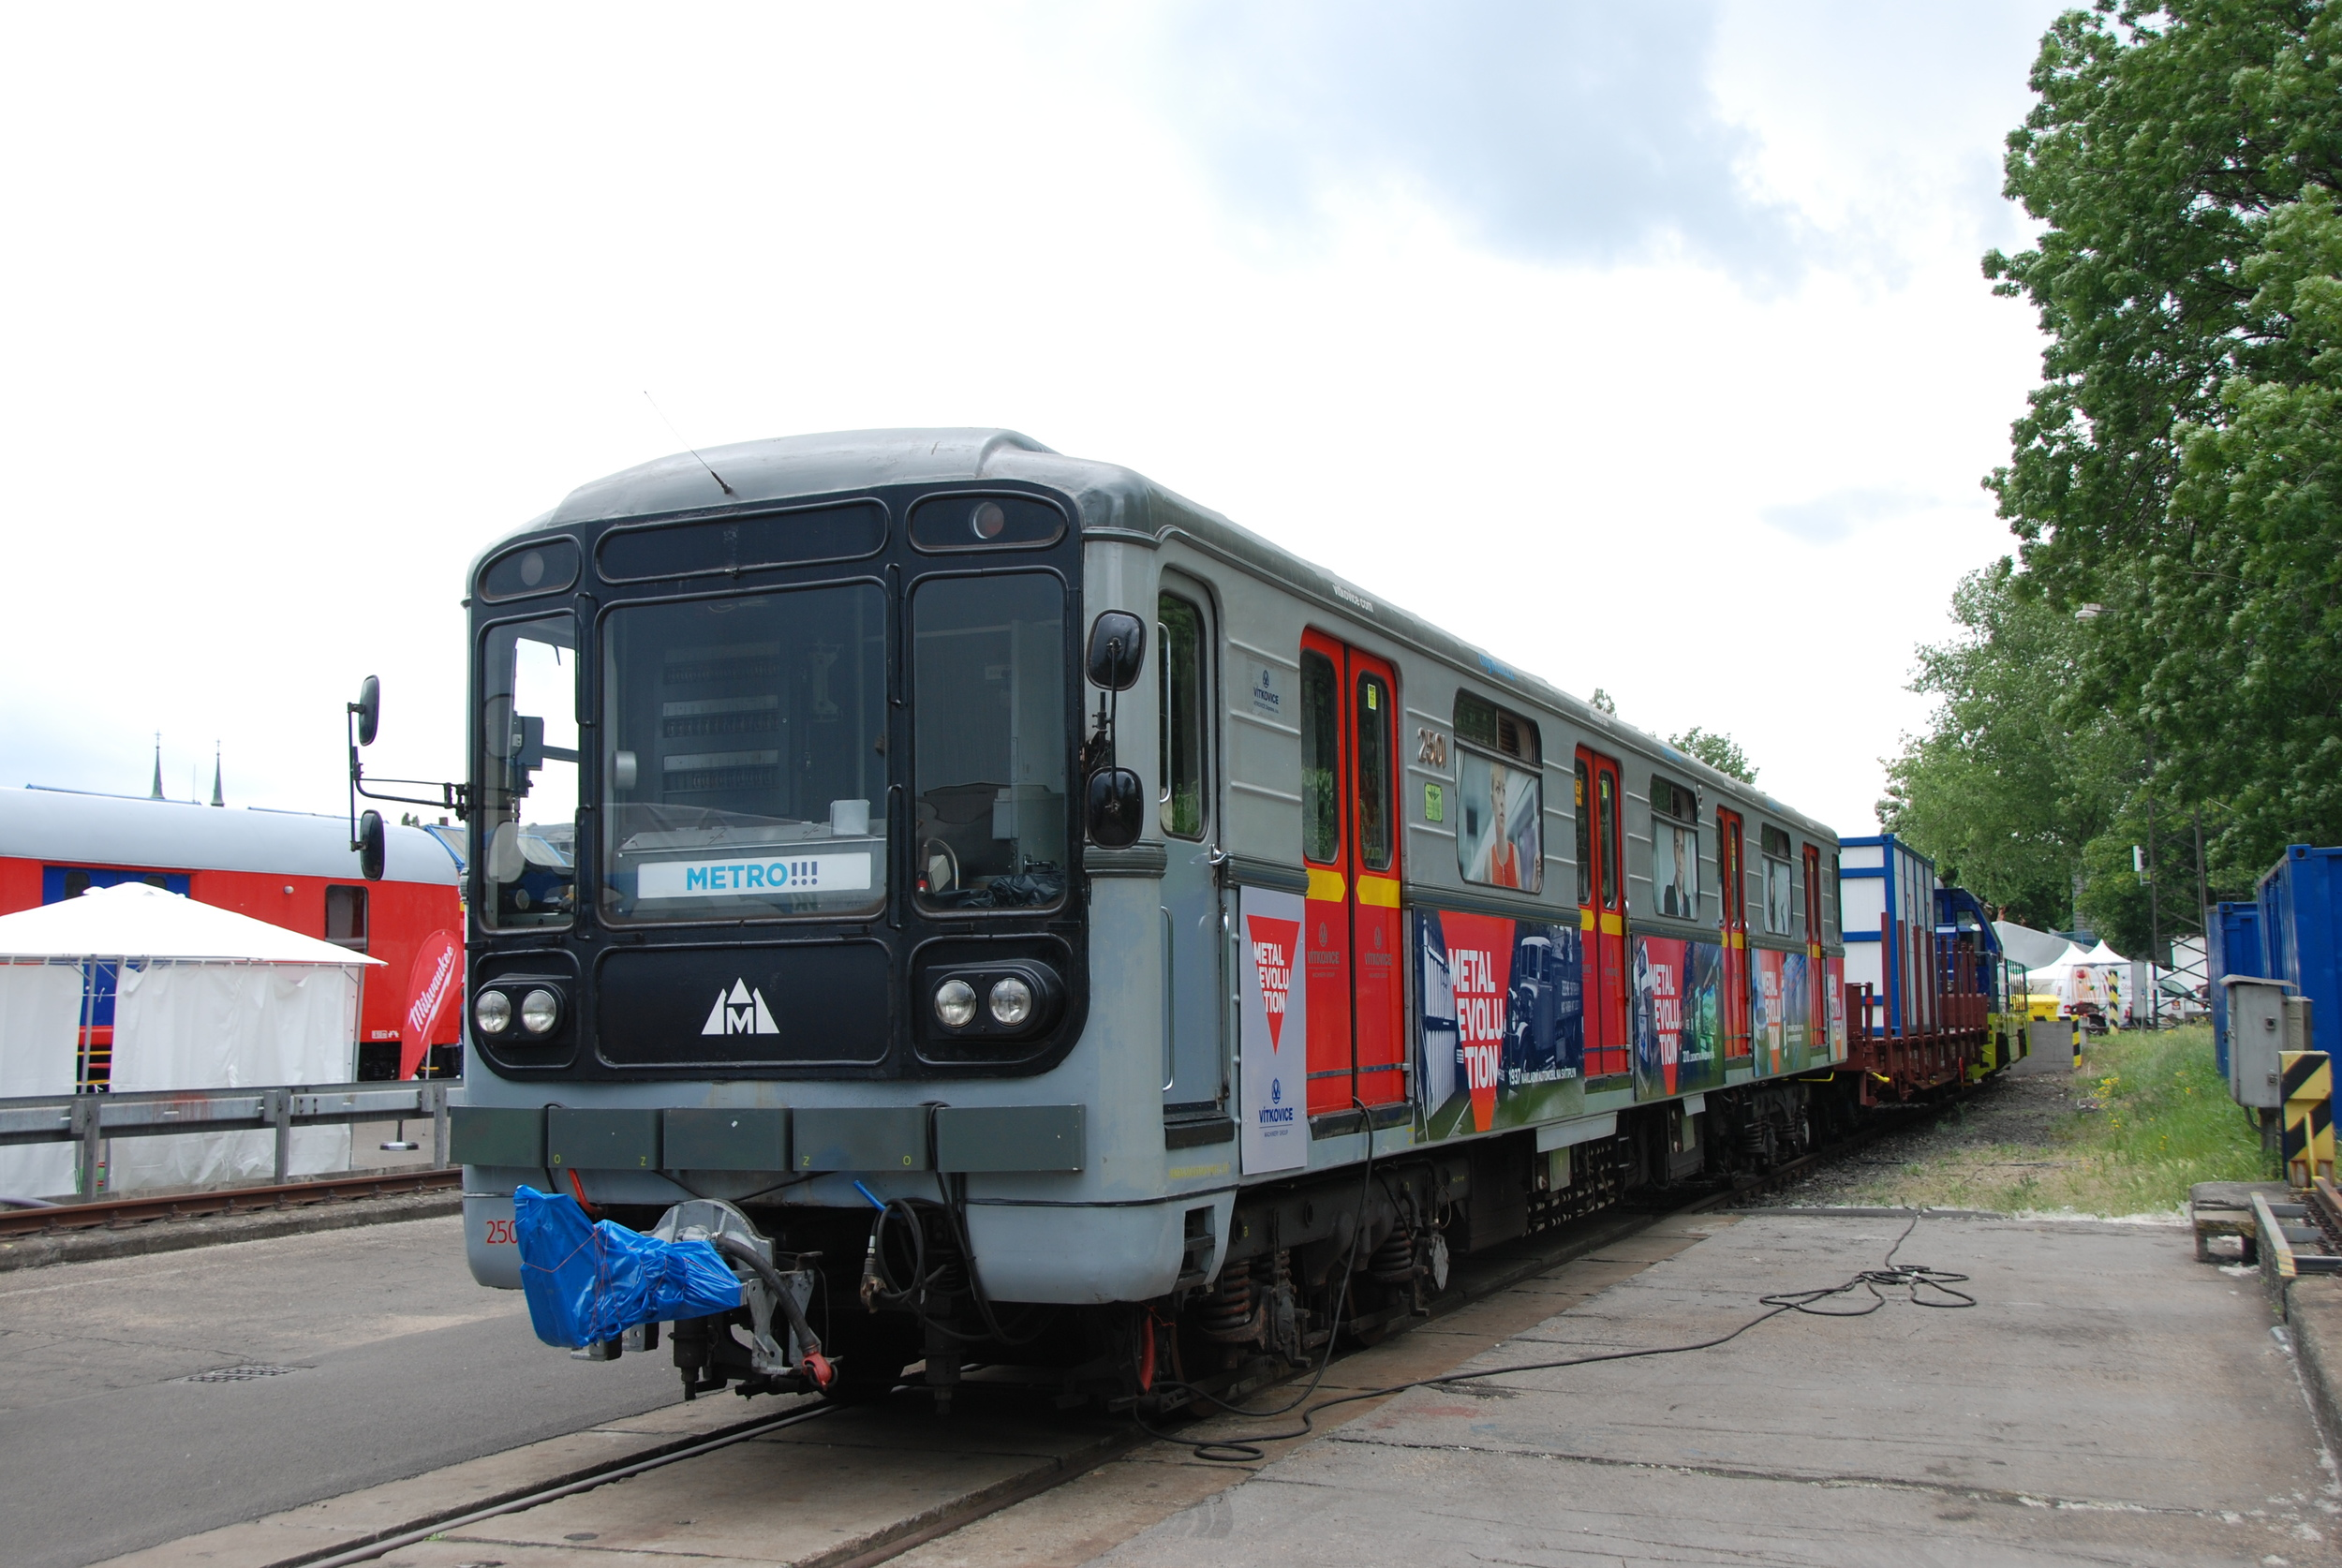 Metro 81-71 společnosti Vítkovice Doprava. (foto: Libor Hinčica)